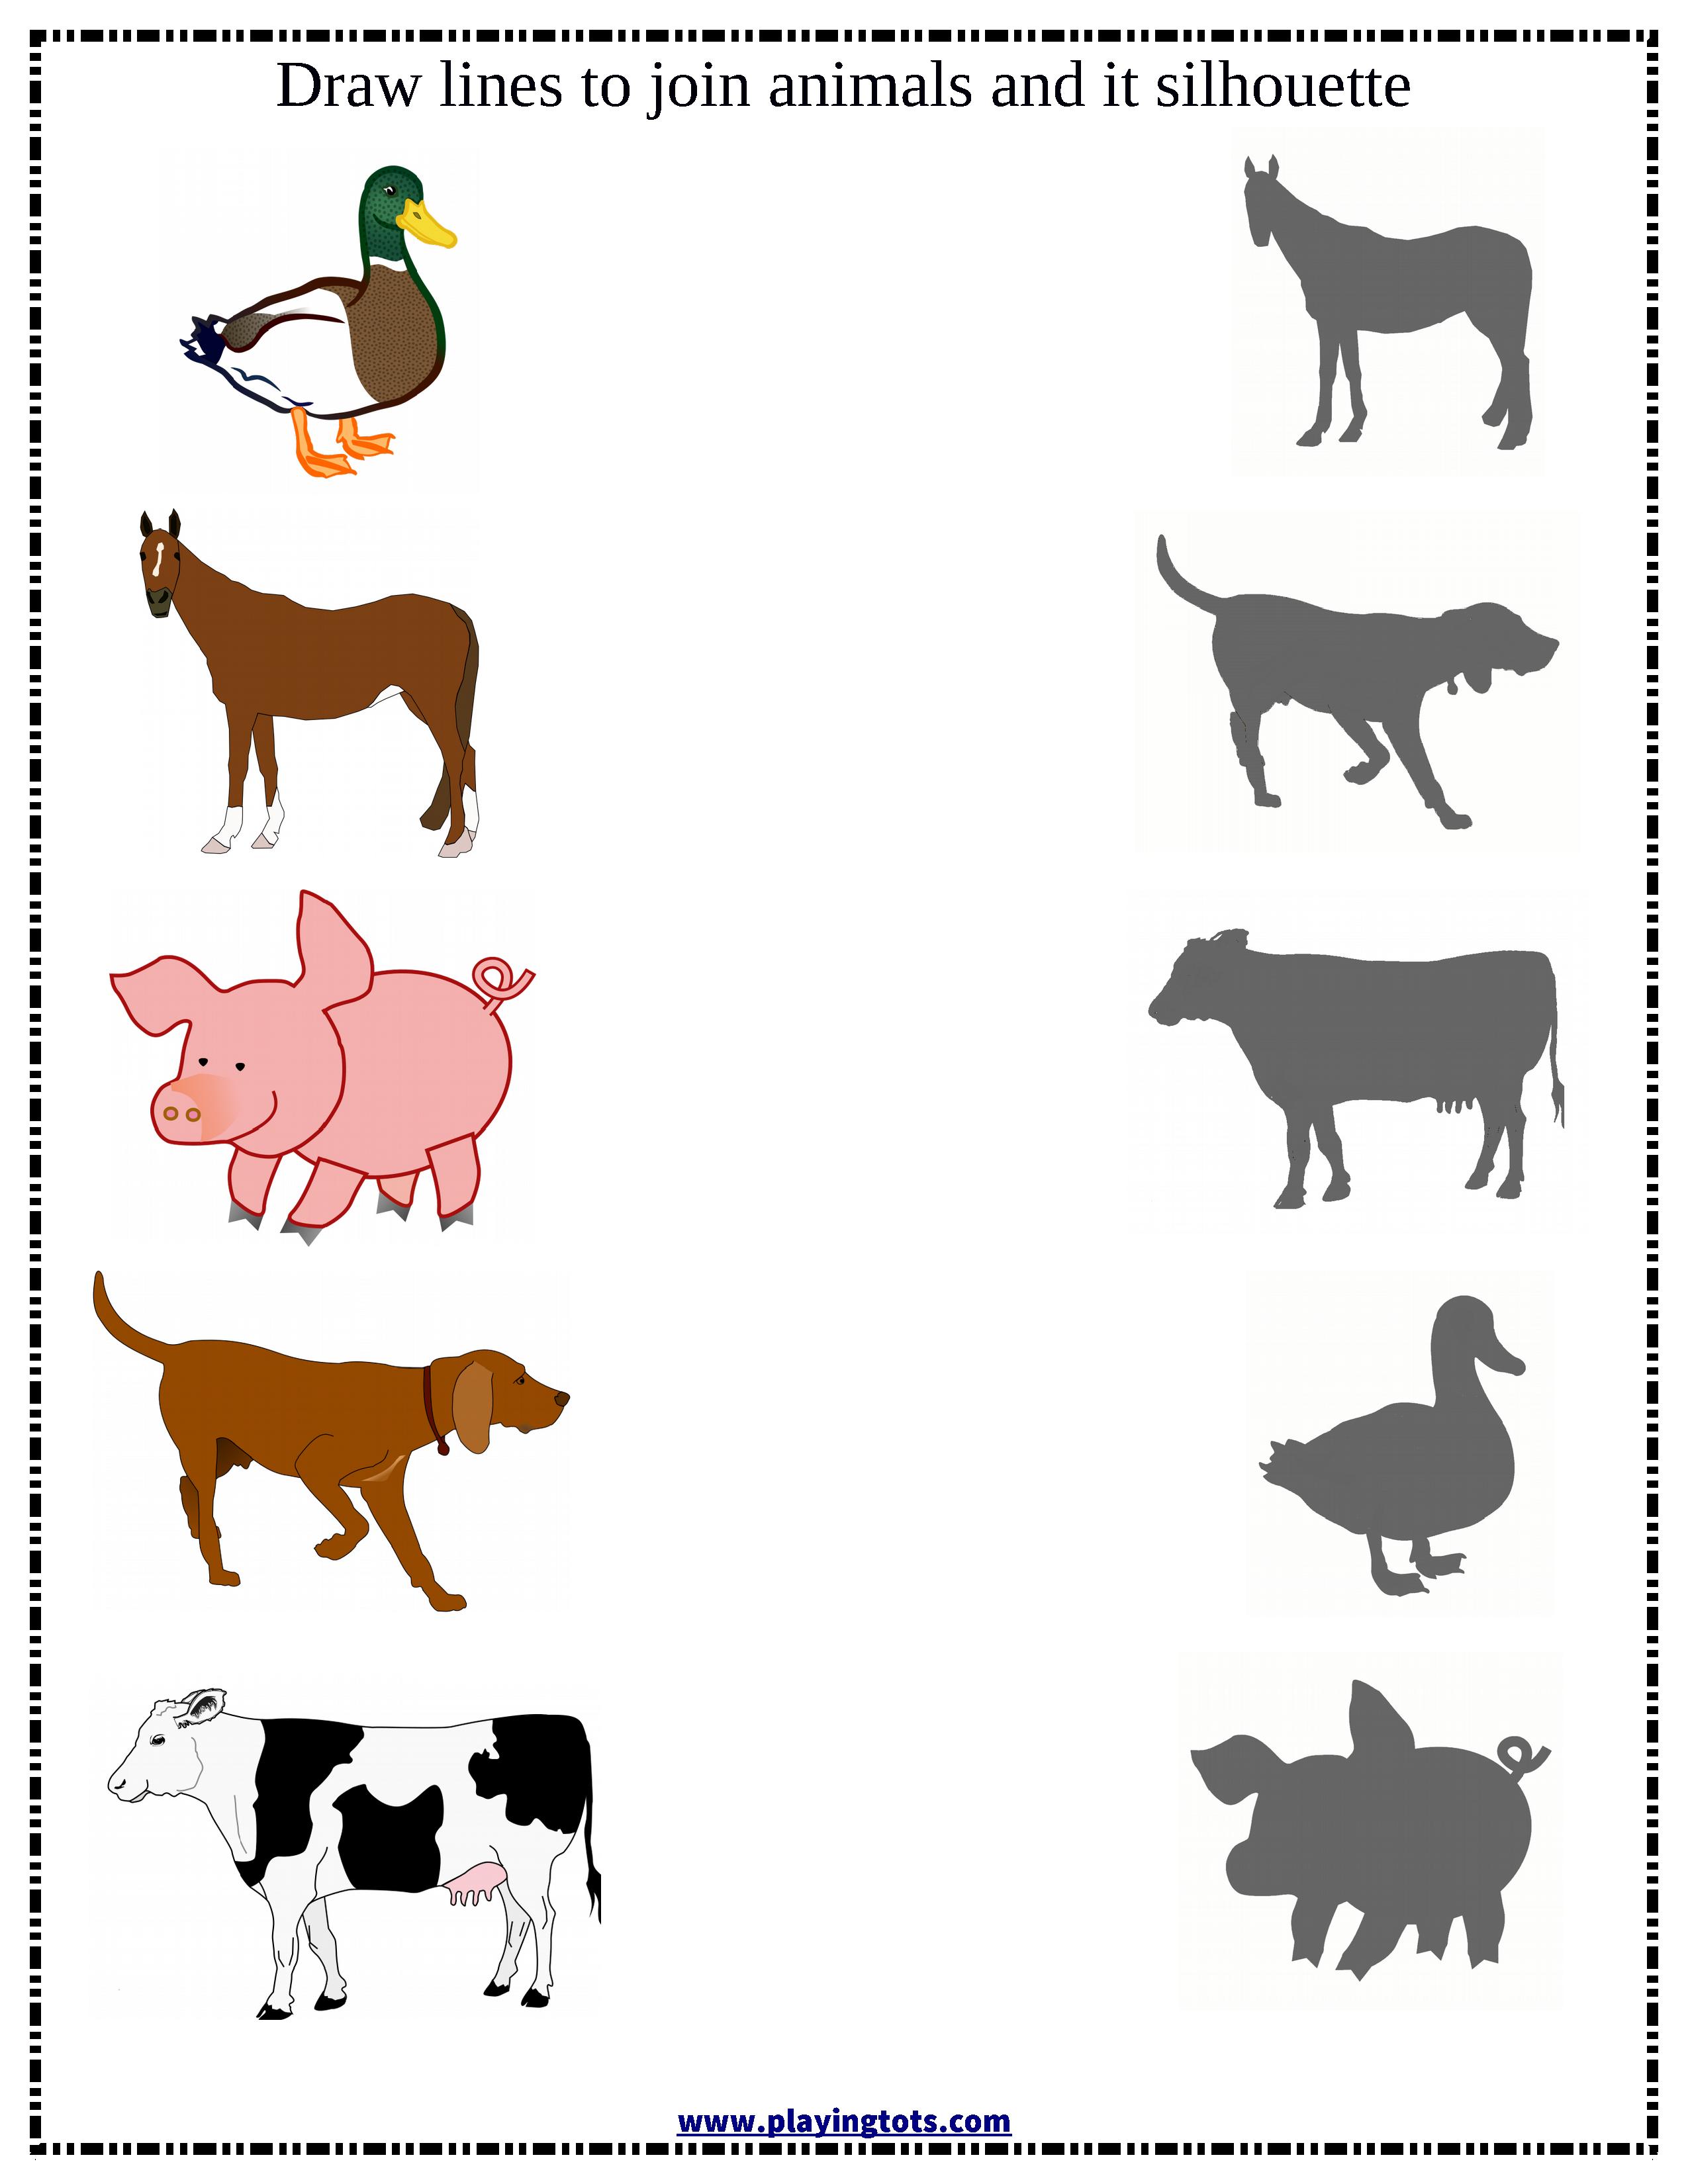 match animals silhouette worksheet free printable file folder learn play toddler preschool mom. Black Bedroom Furniture Sets. Home Design Ideas